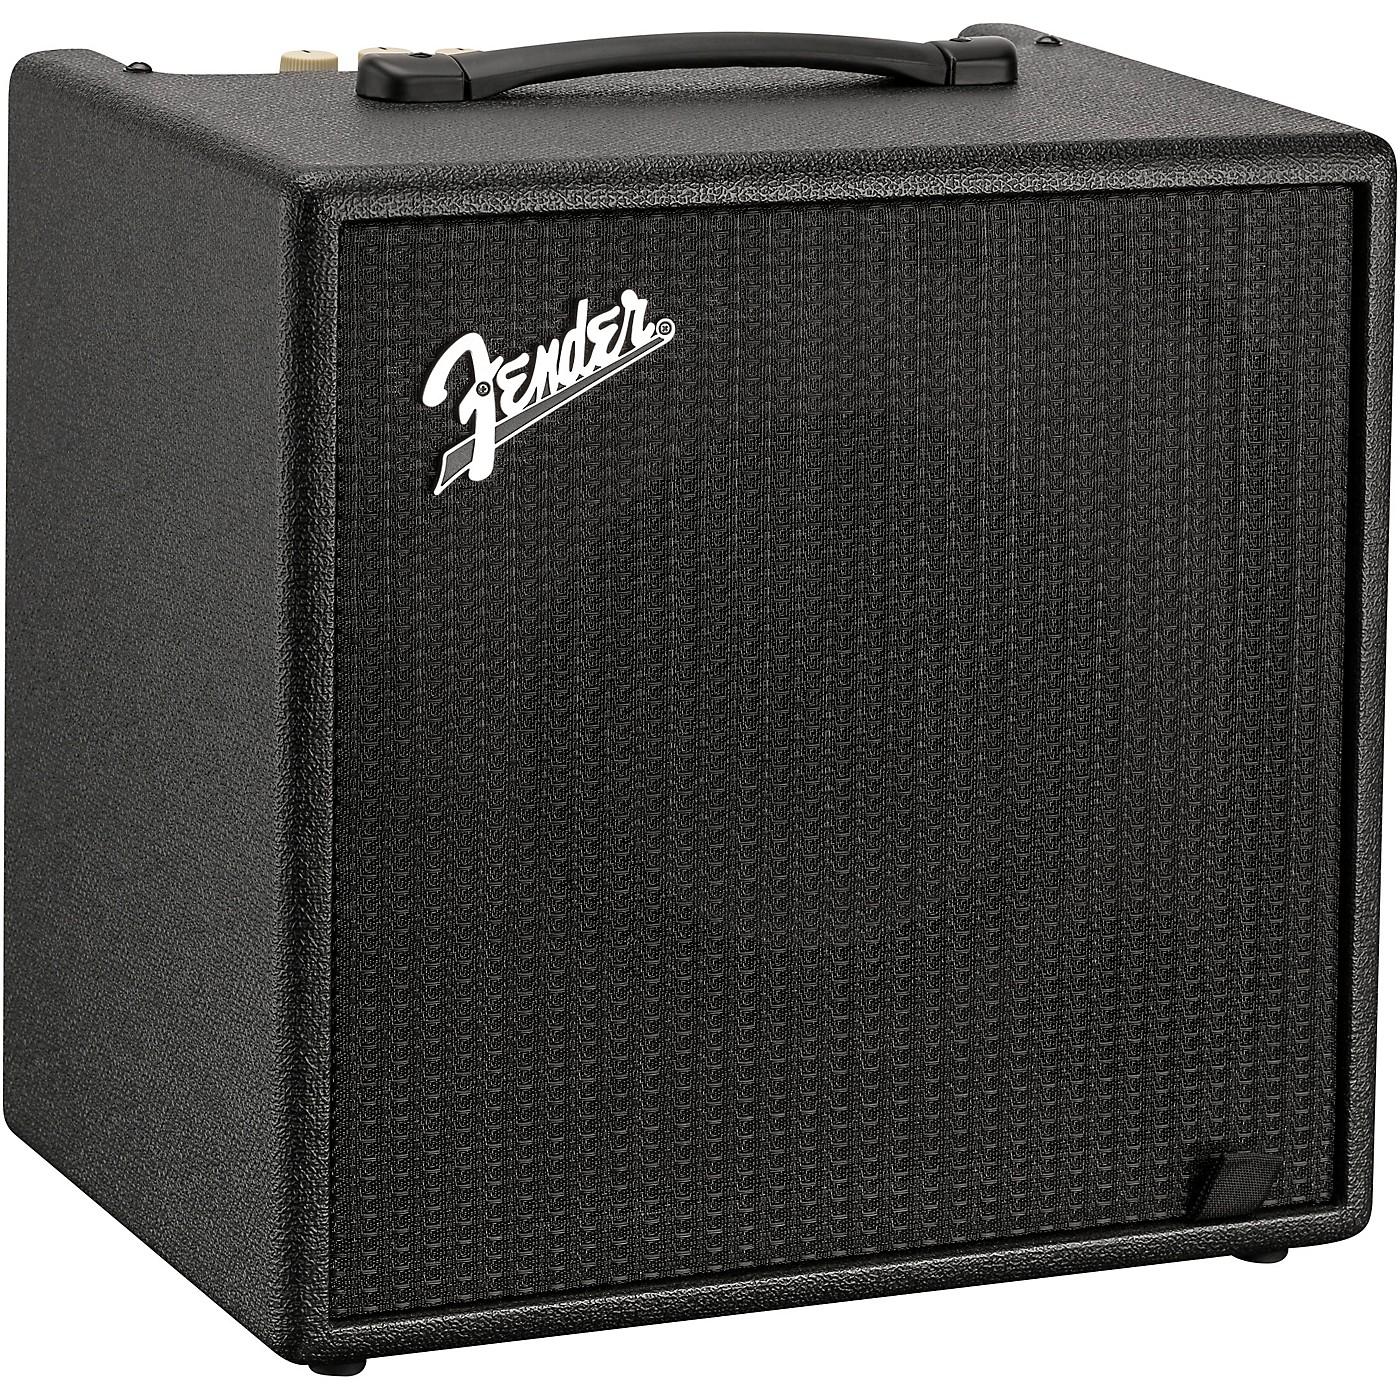 Fender Rumble LT25 25W 1x8 Bass Combo Amp thumbnail